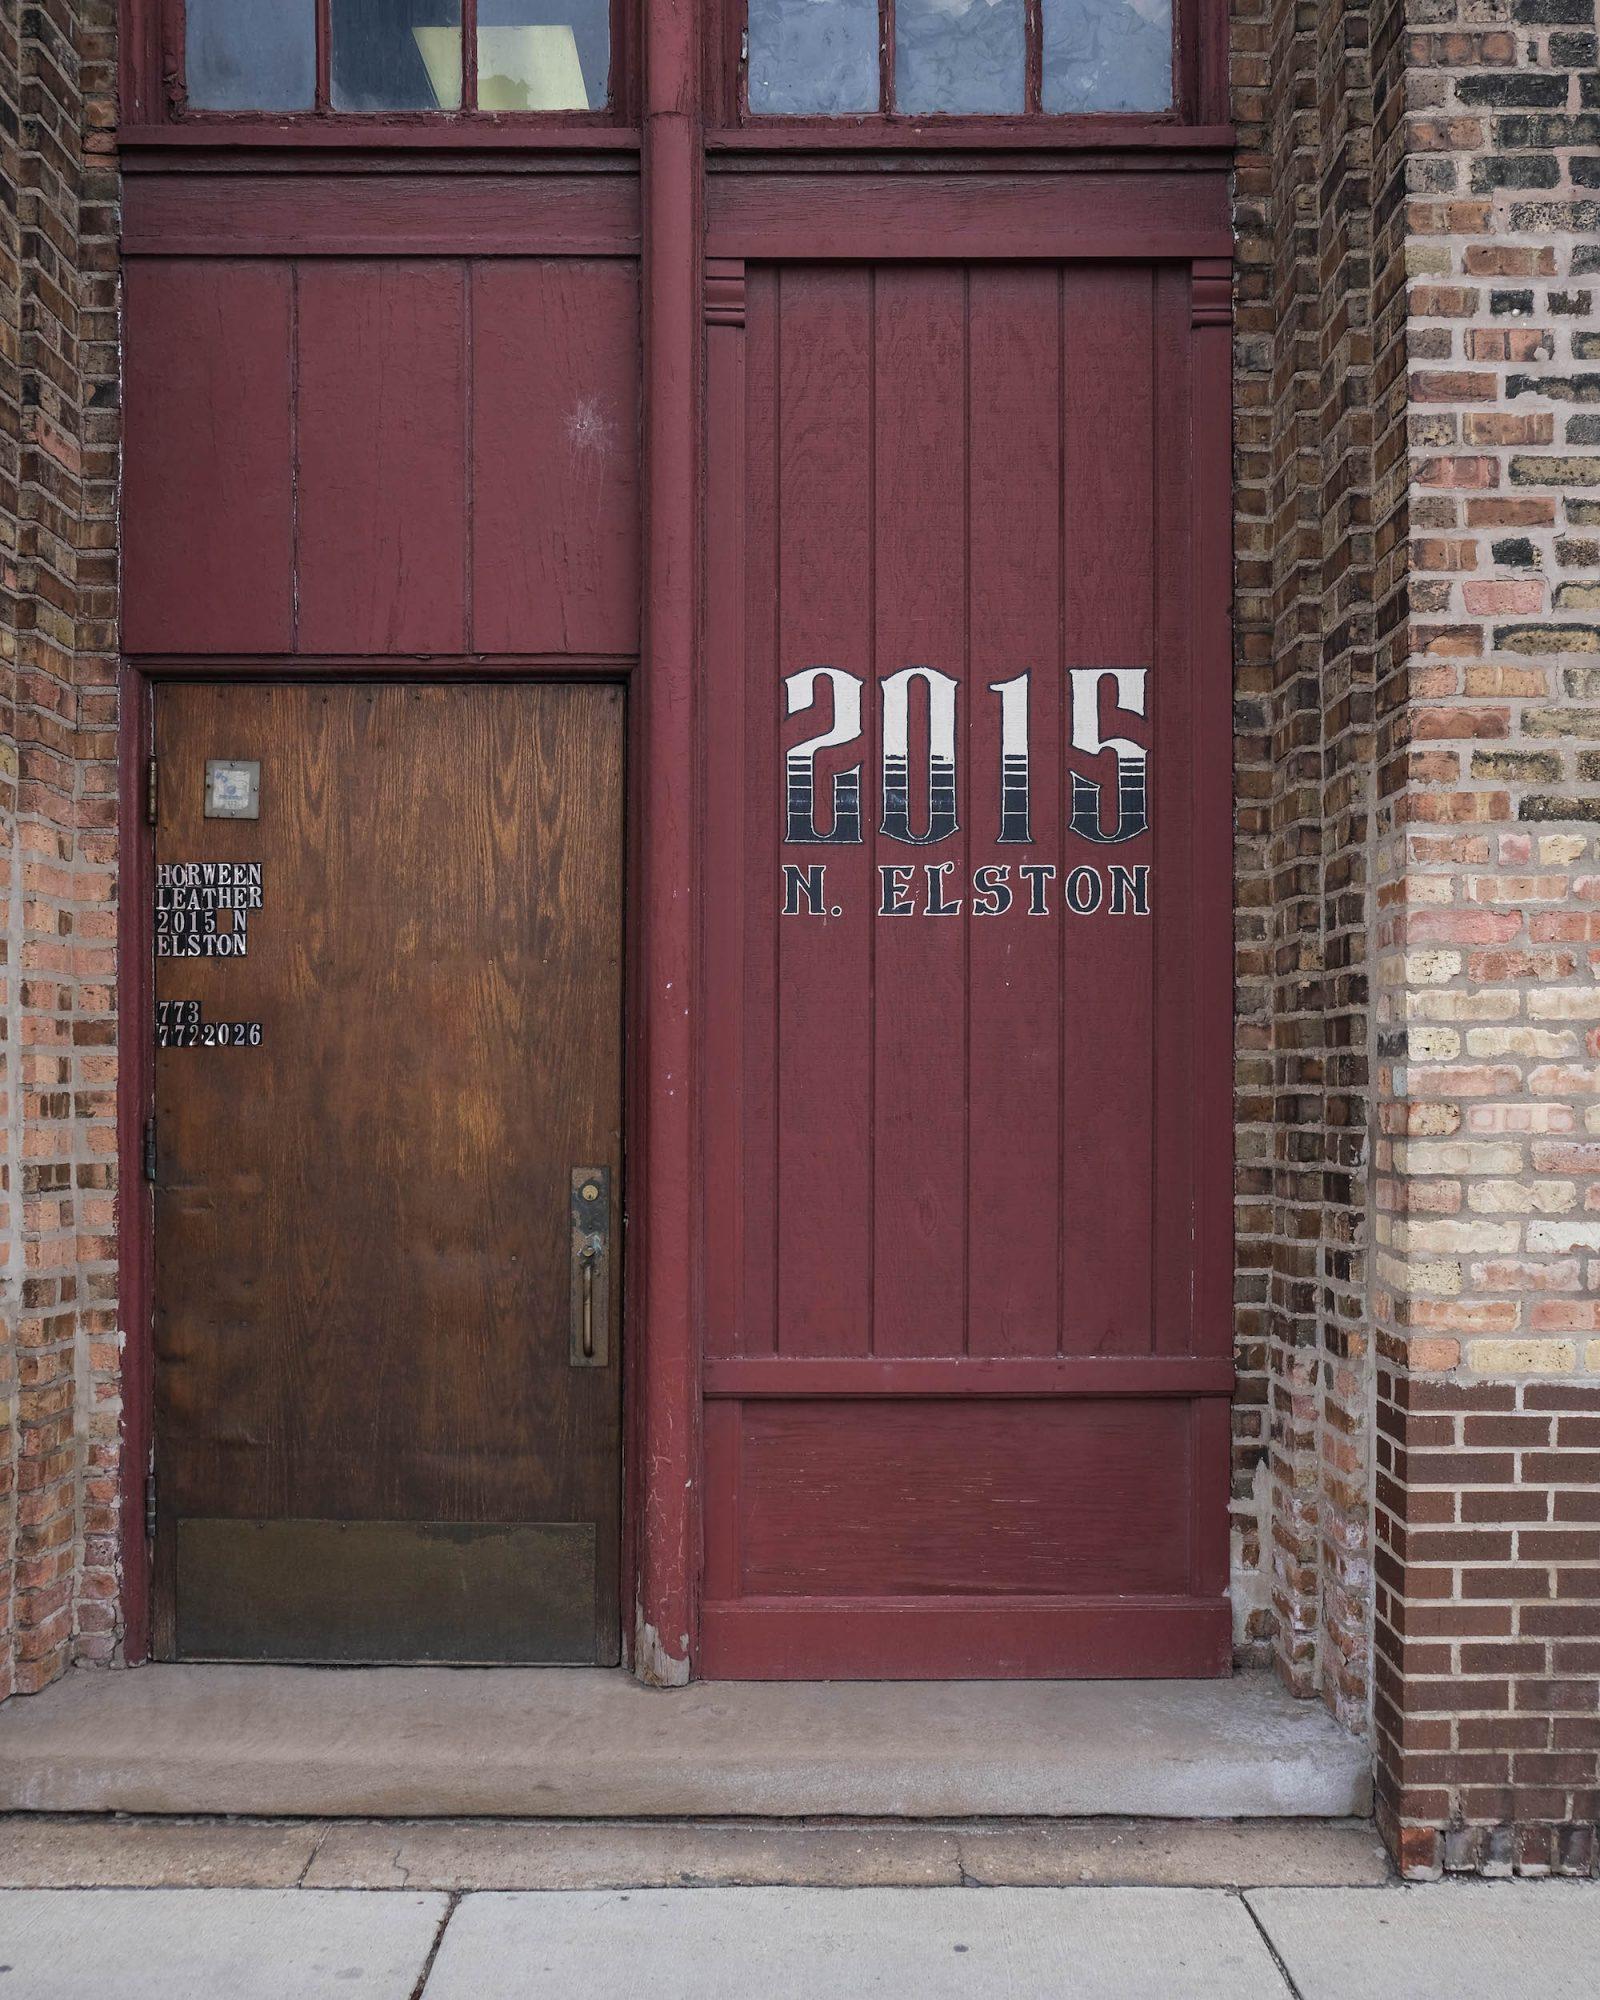 2015 elson street Tannerie Horween